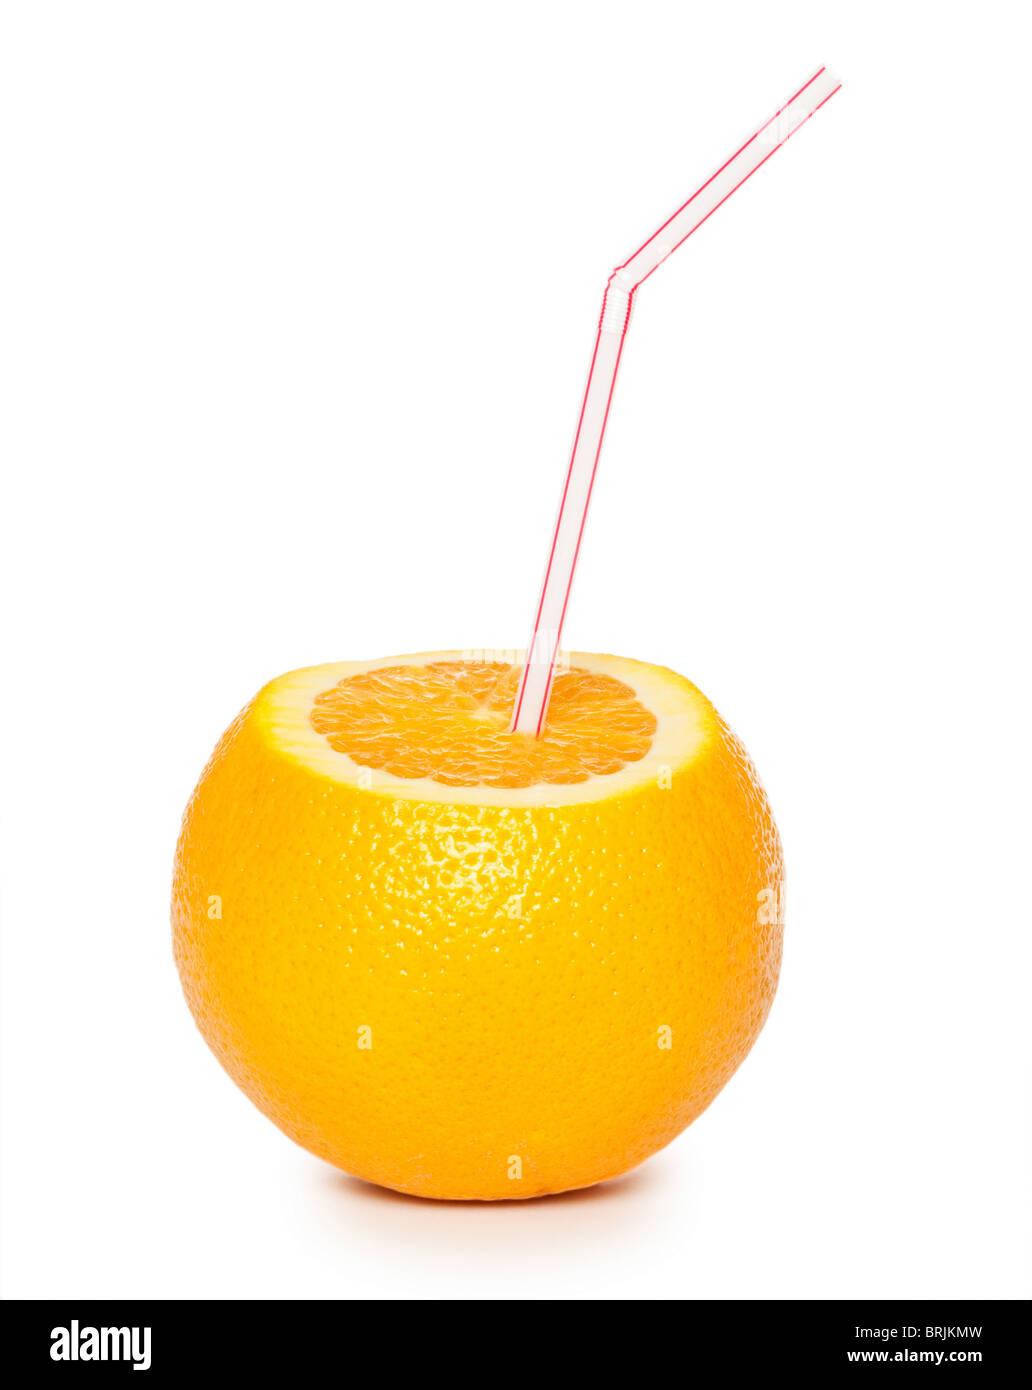 Orange with coctail straw isolated on white background - Stock Image